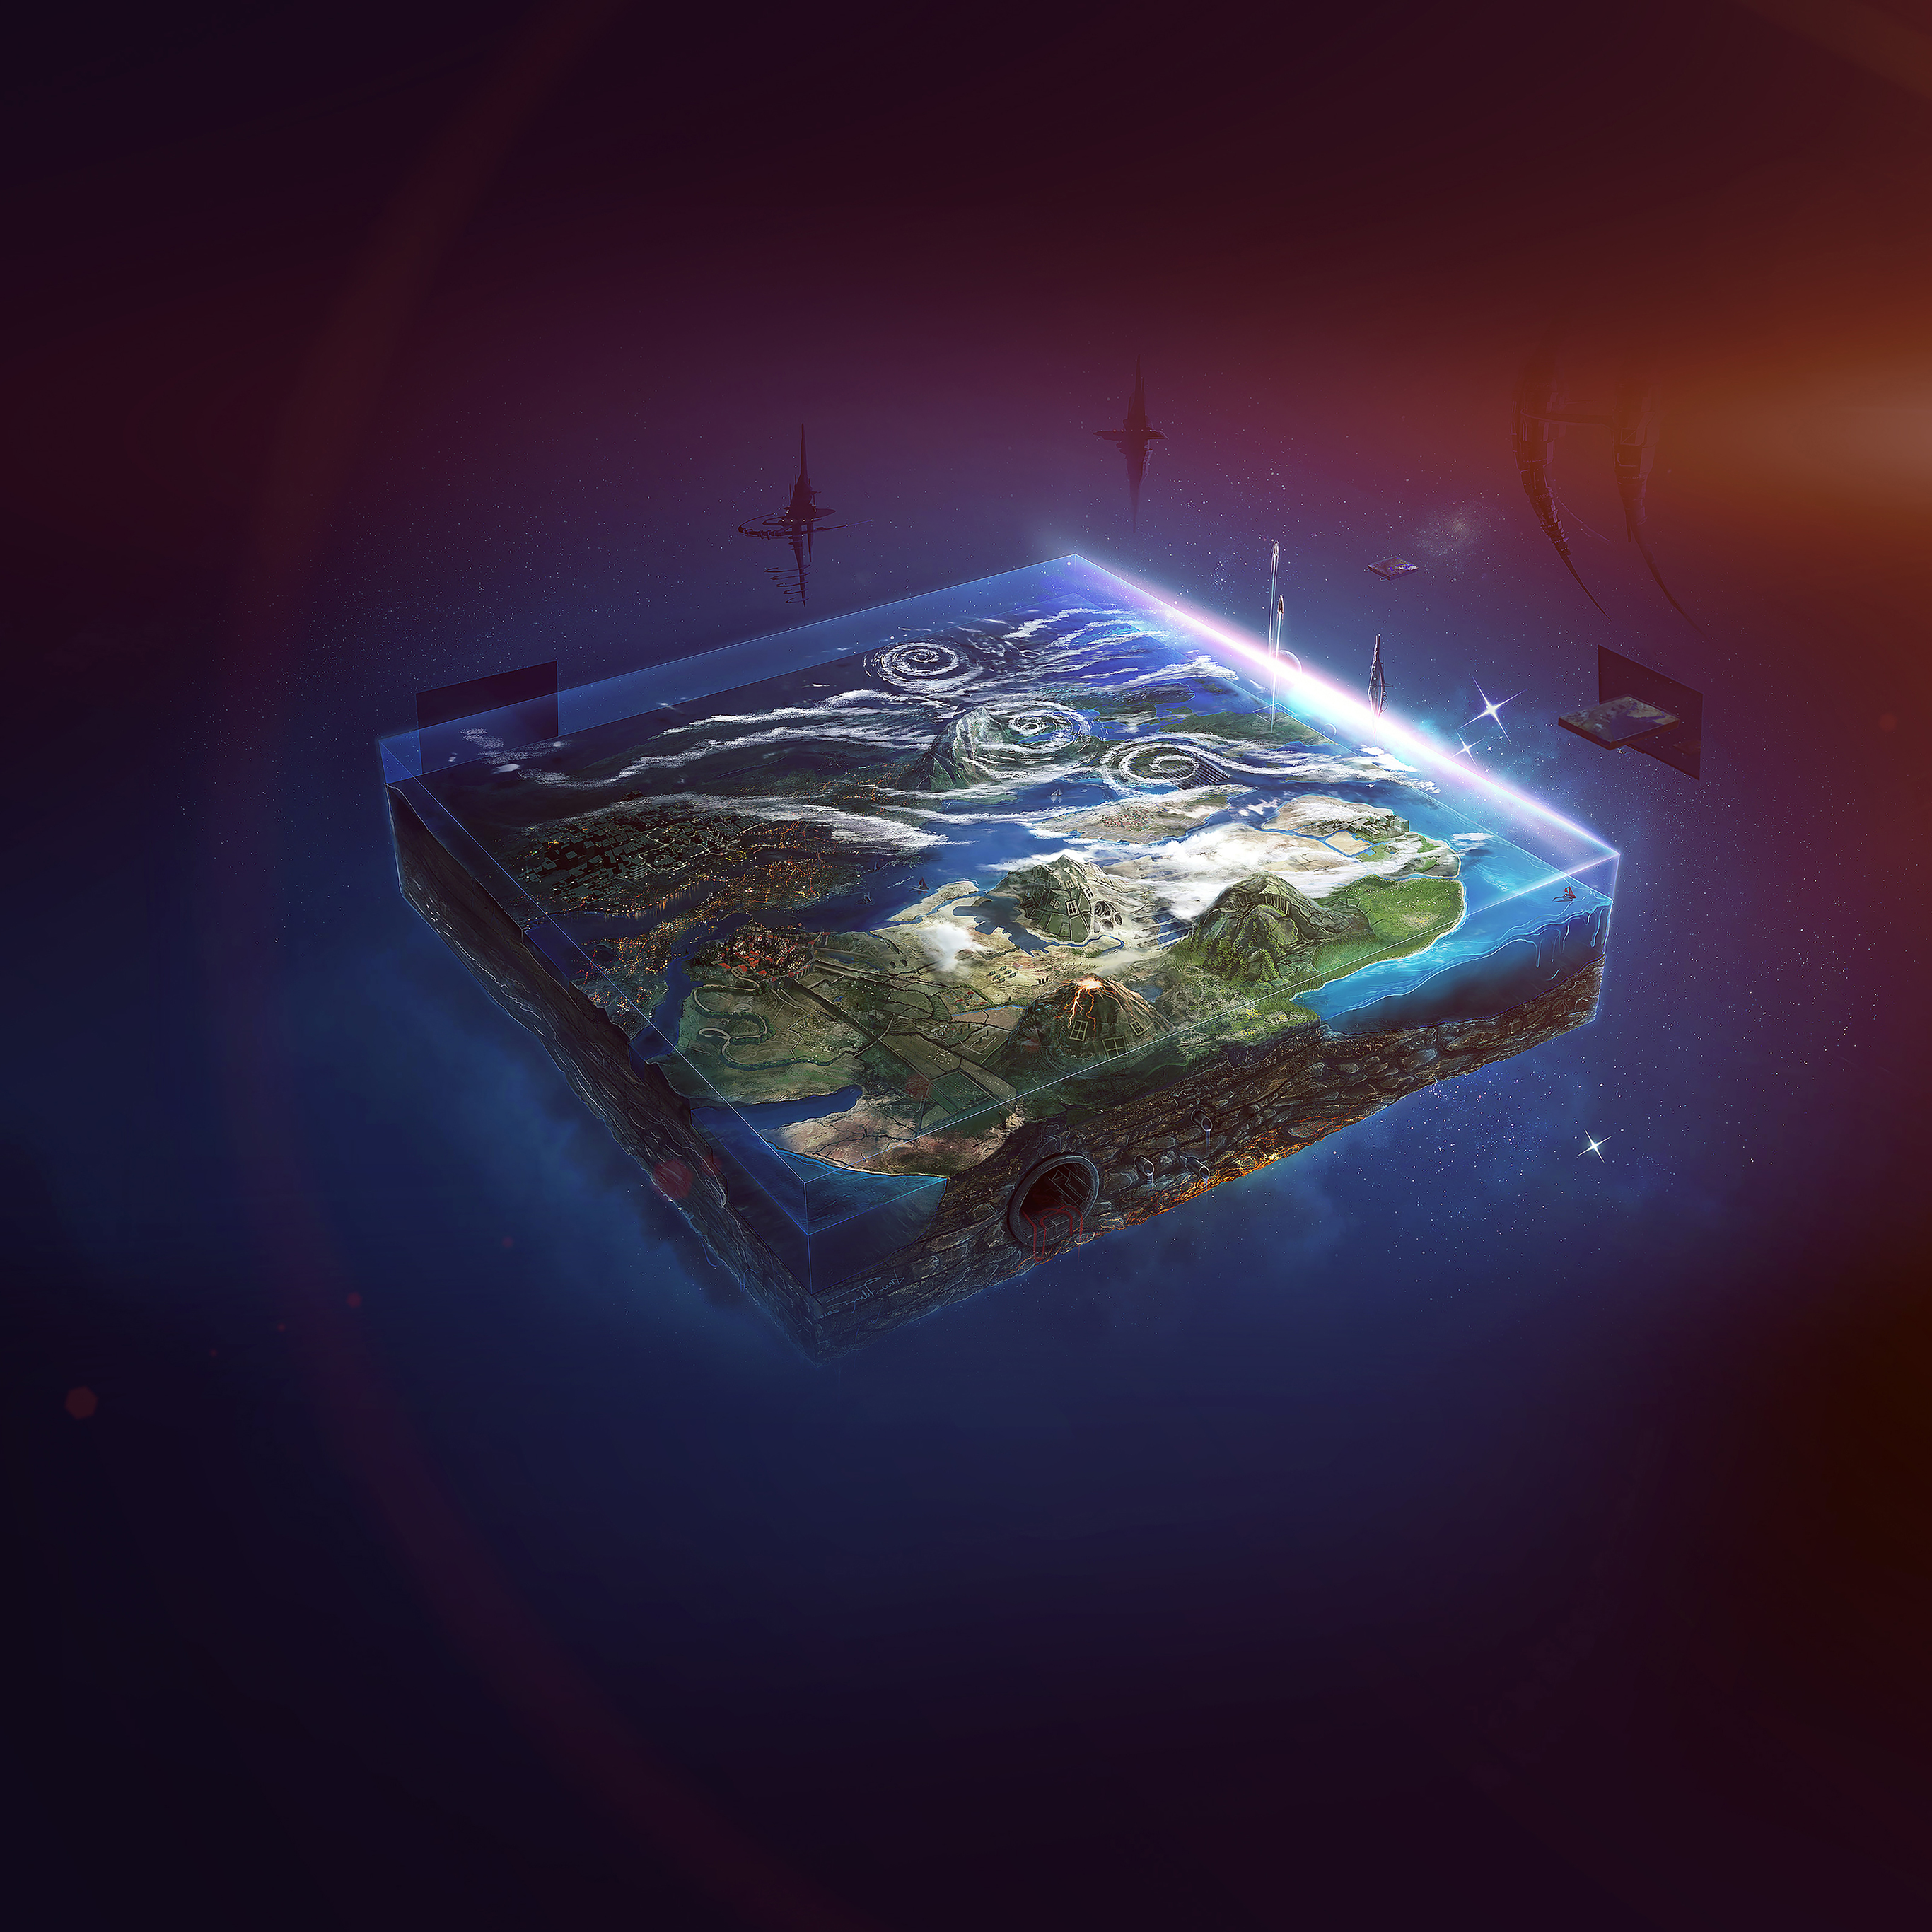 Desktop Wallpaper Earth From Space: Ai95-flat-earth-art-flare-illust-space